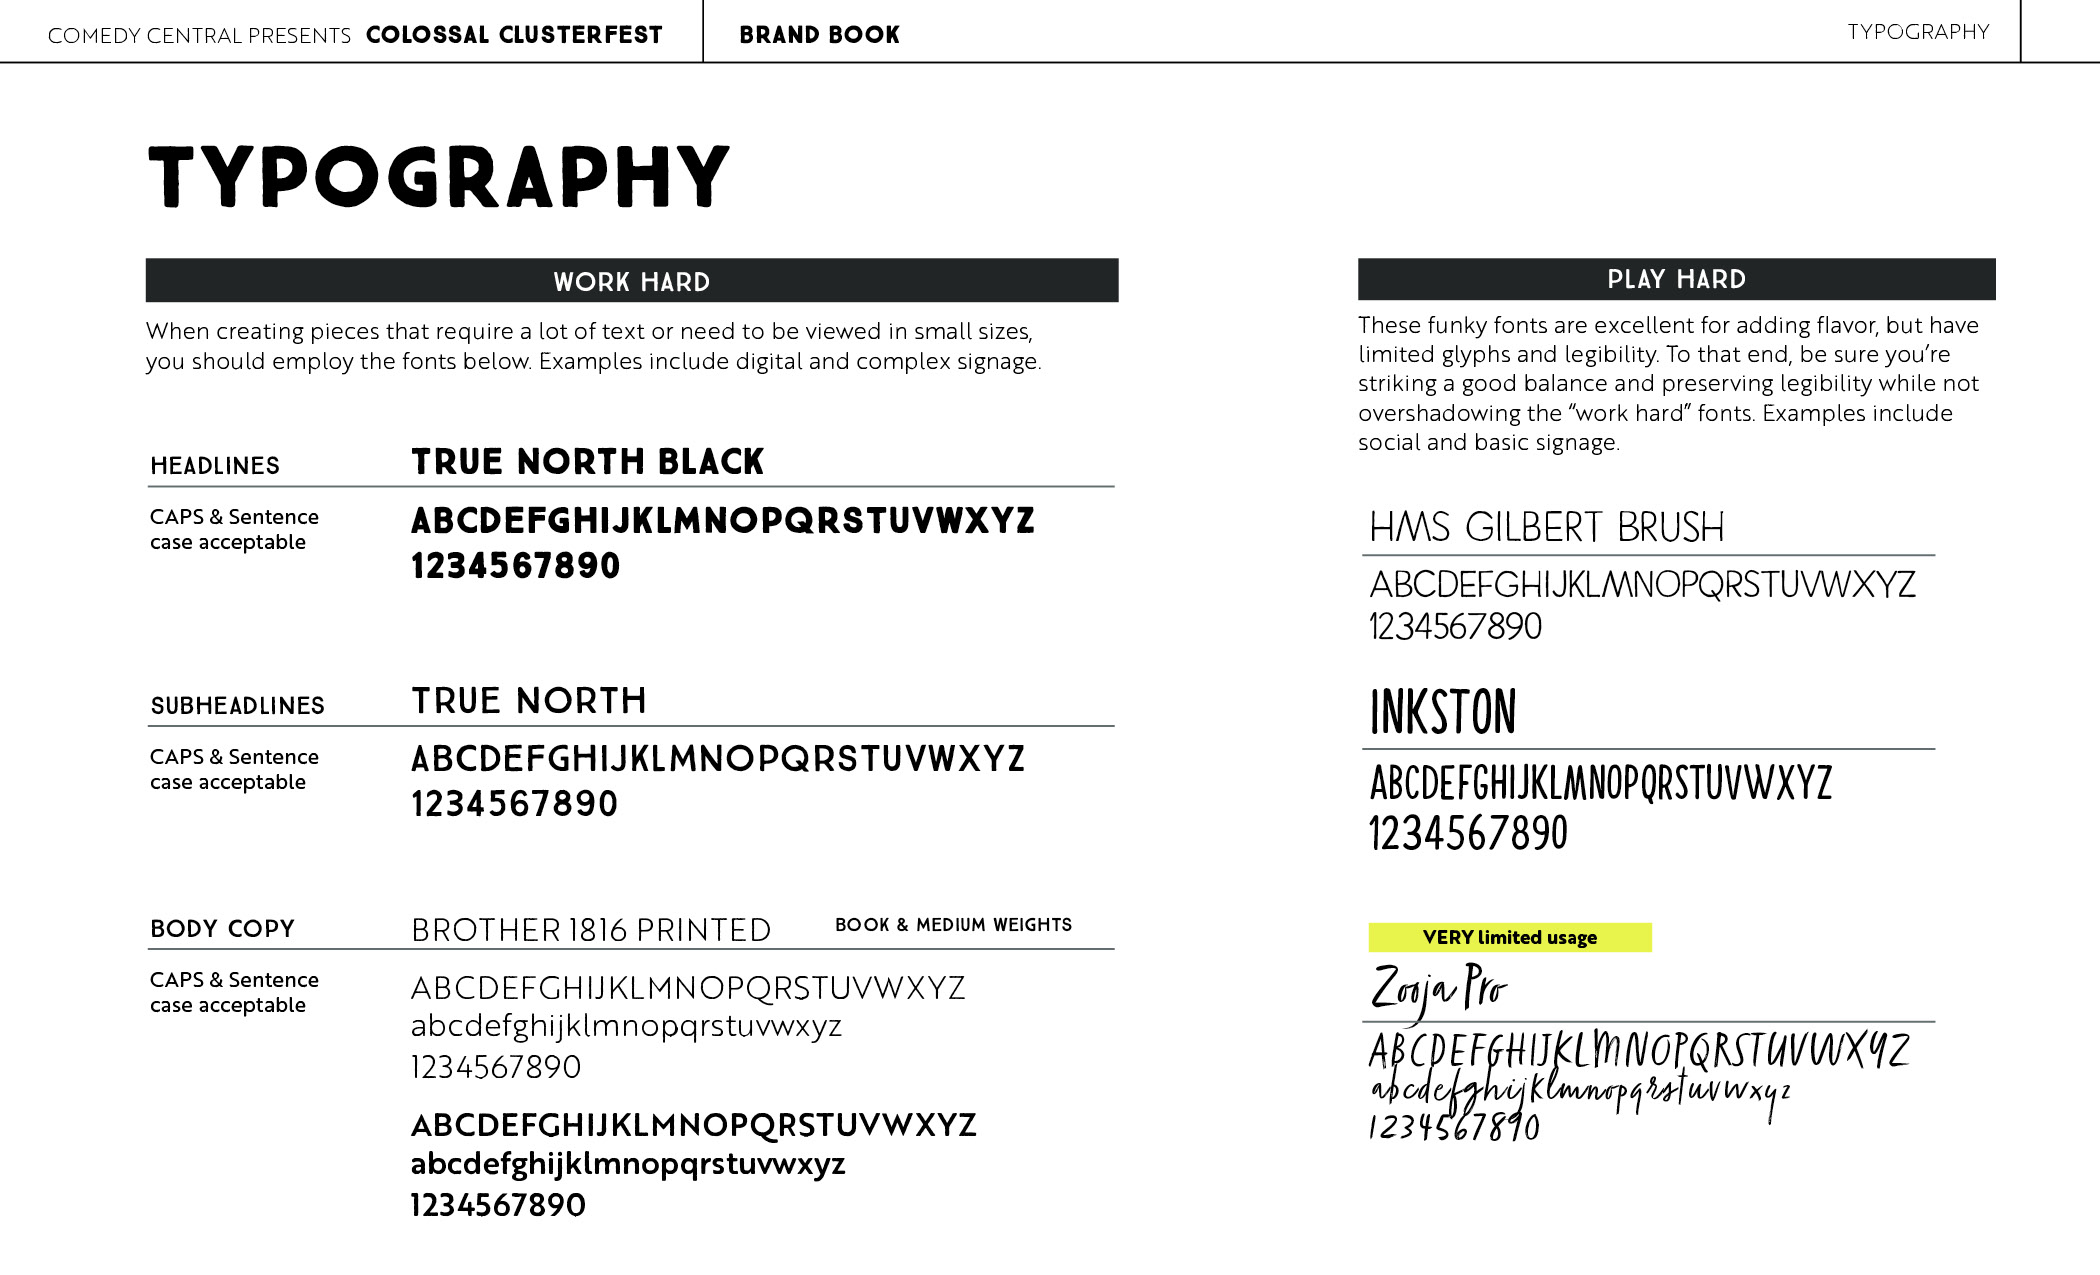 BrandBook-ClusterfestTypography.jpg